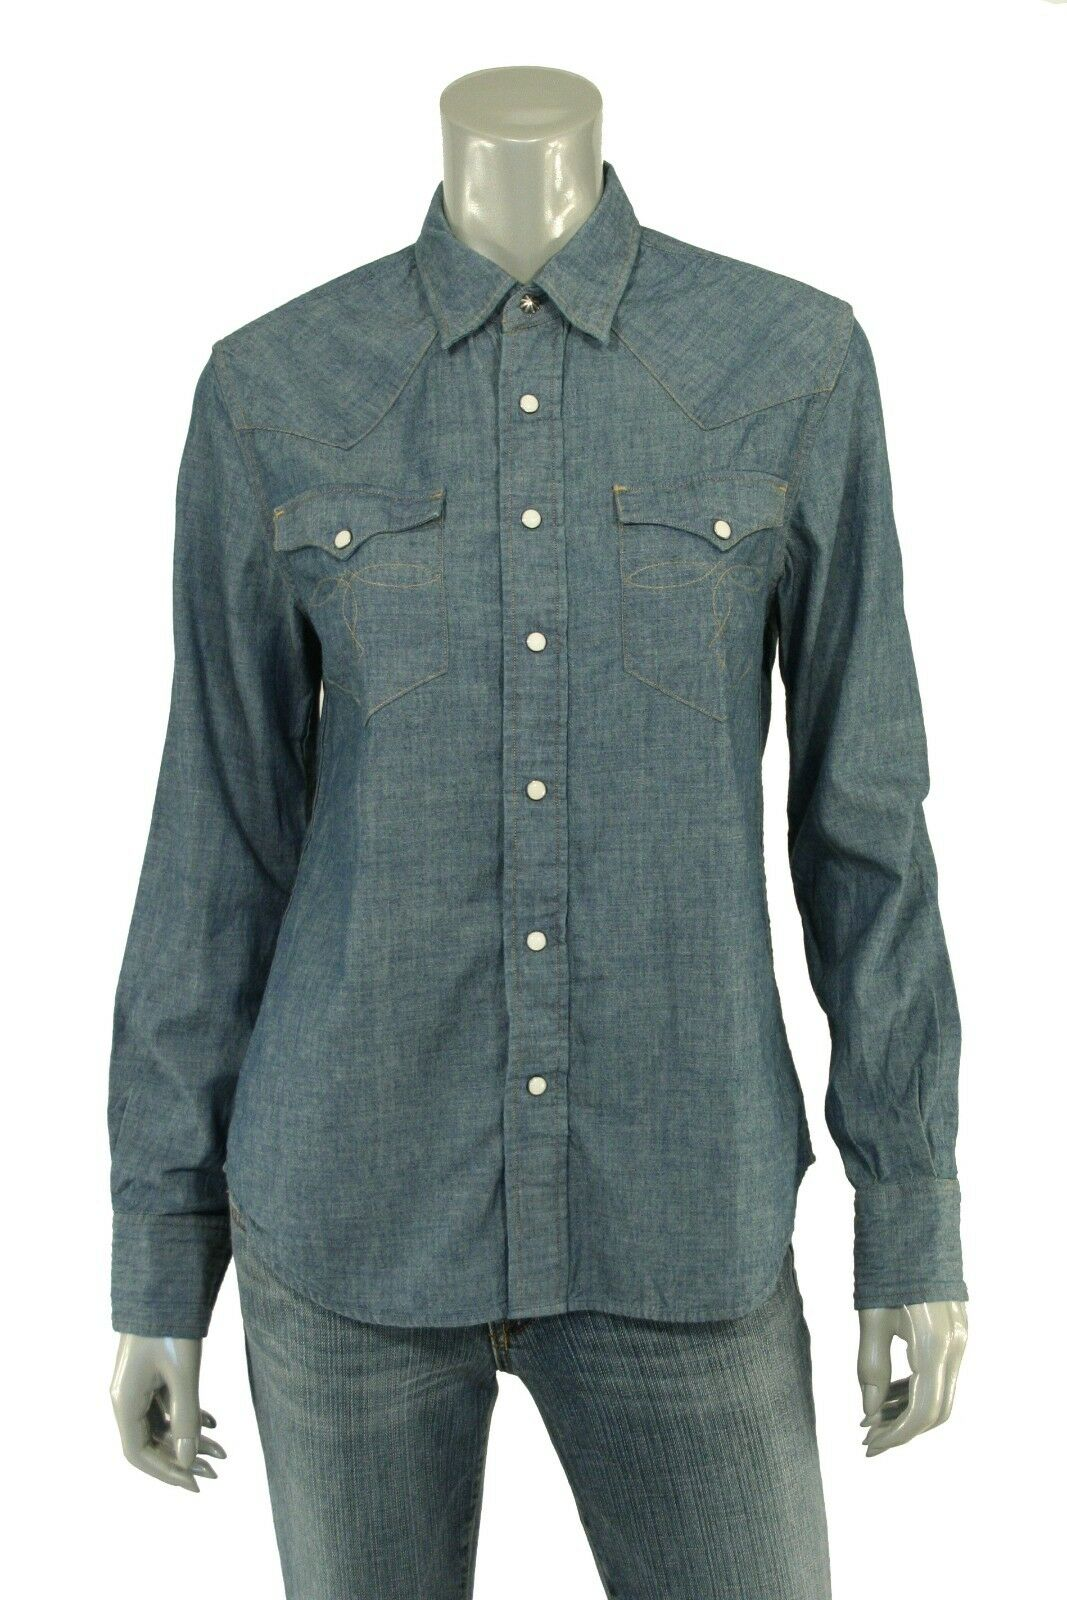 Woherren Ralph Lauren RRL Vintage Western Denim Shirt New